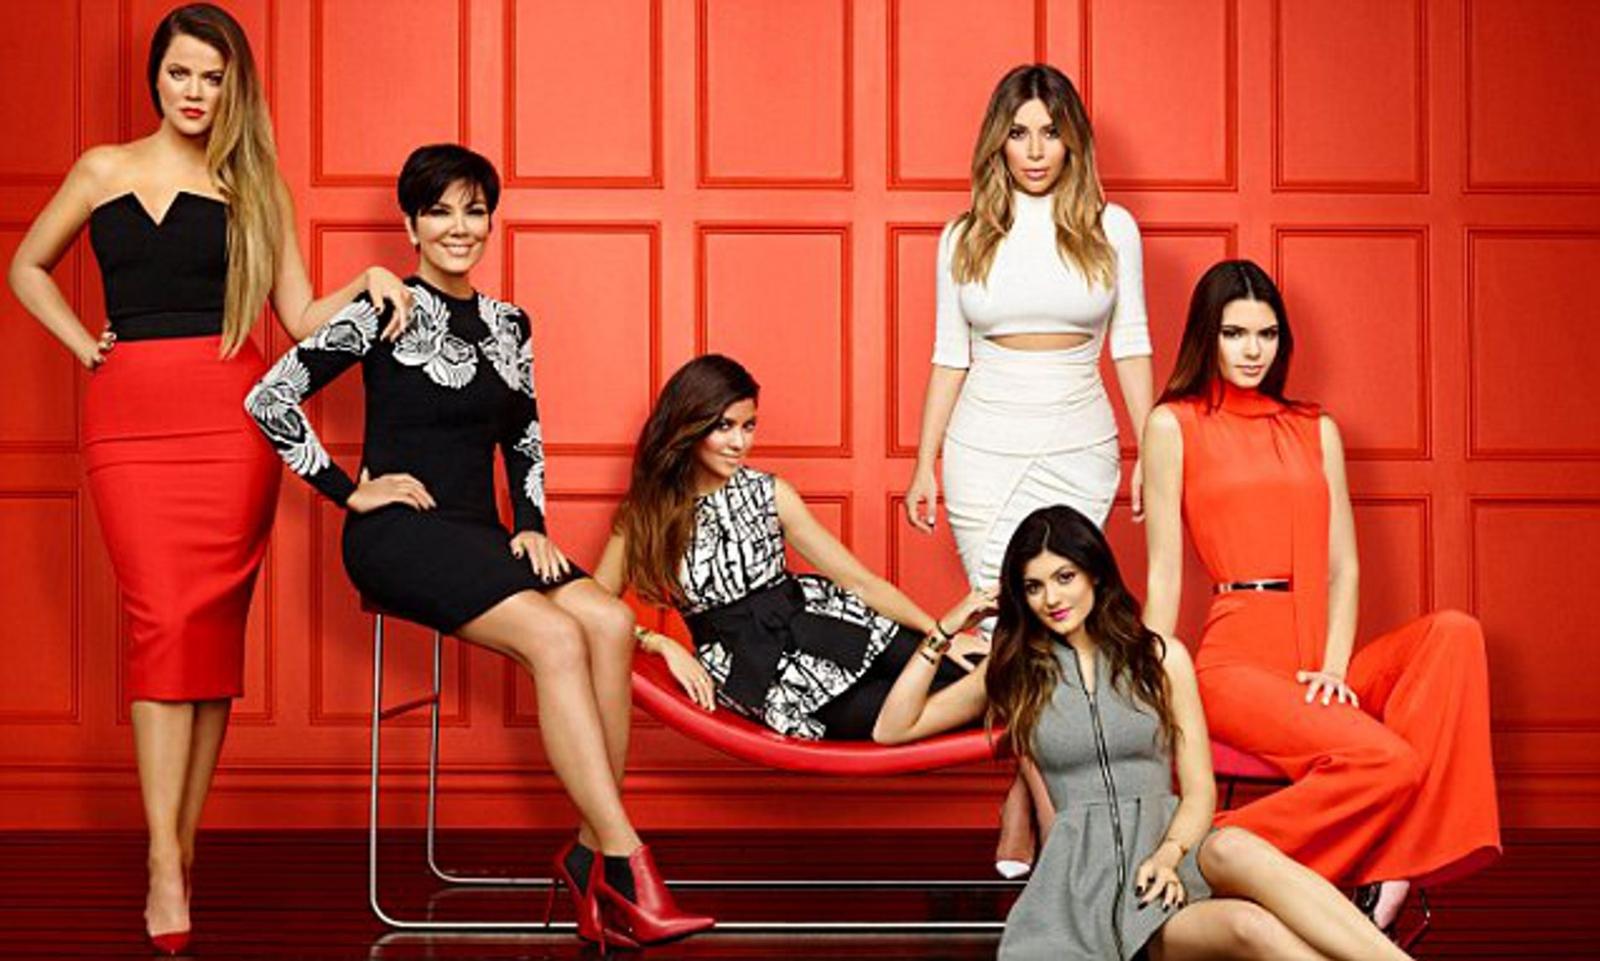 Kourtney Kardashian abandona el reality show 'Keeping Up With the Kardashians'